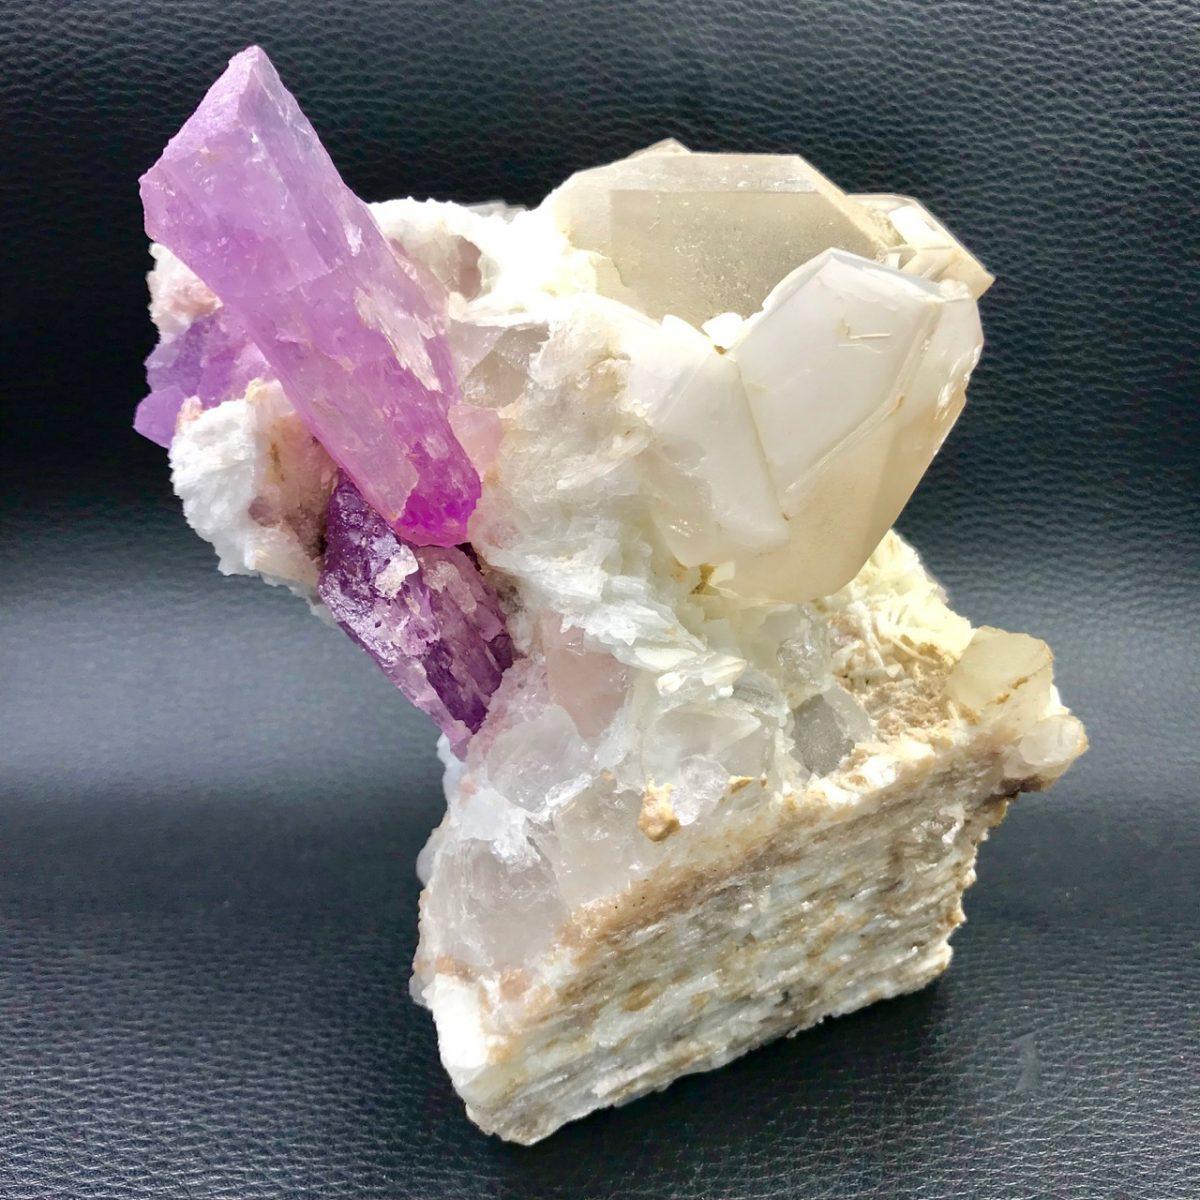 kunzite-sur-quartz